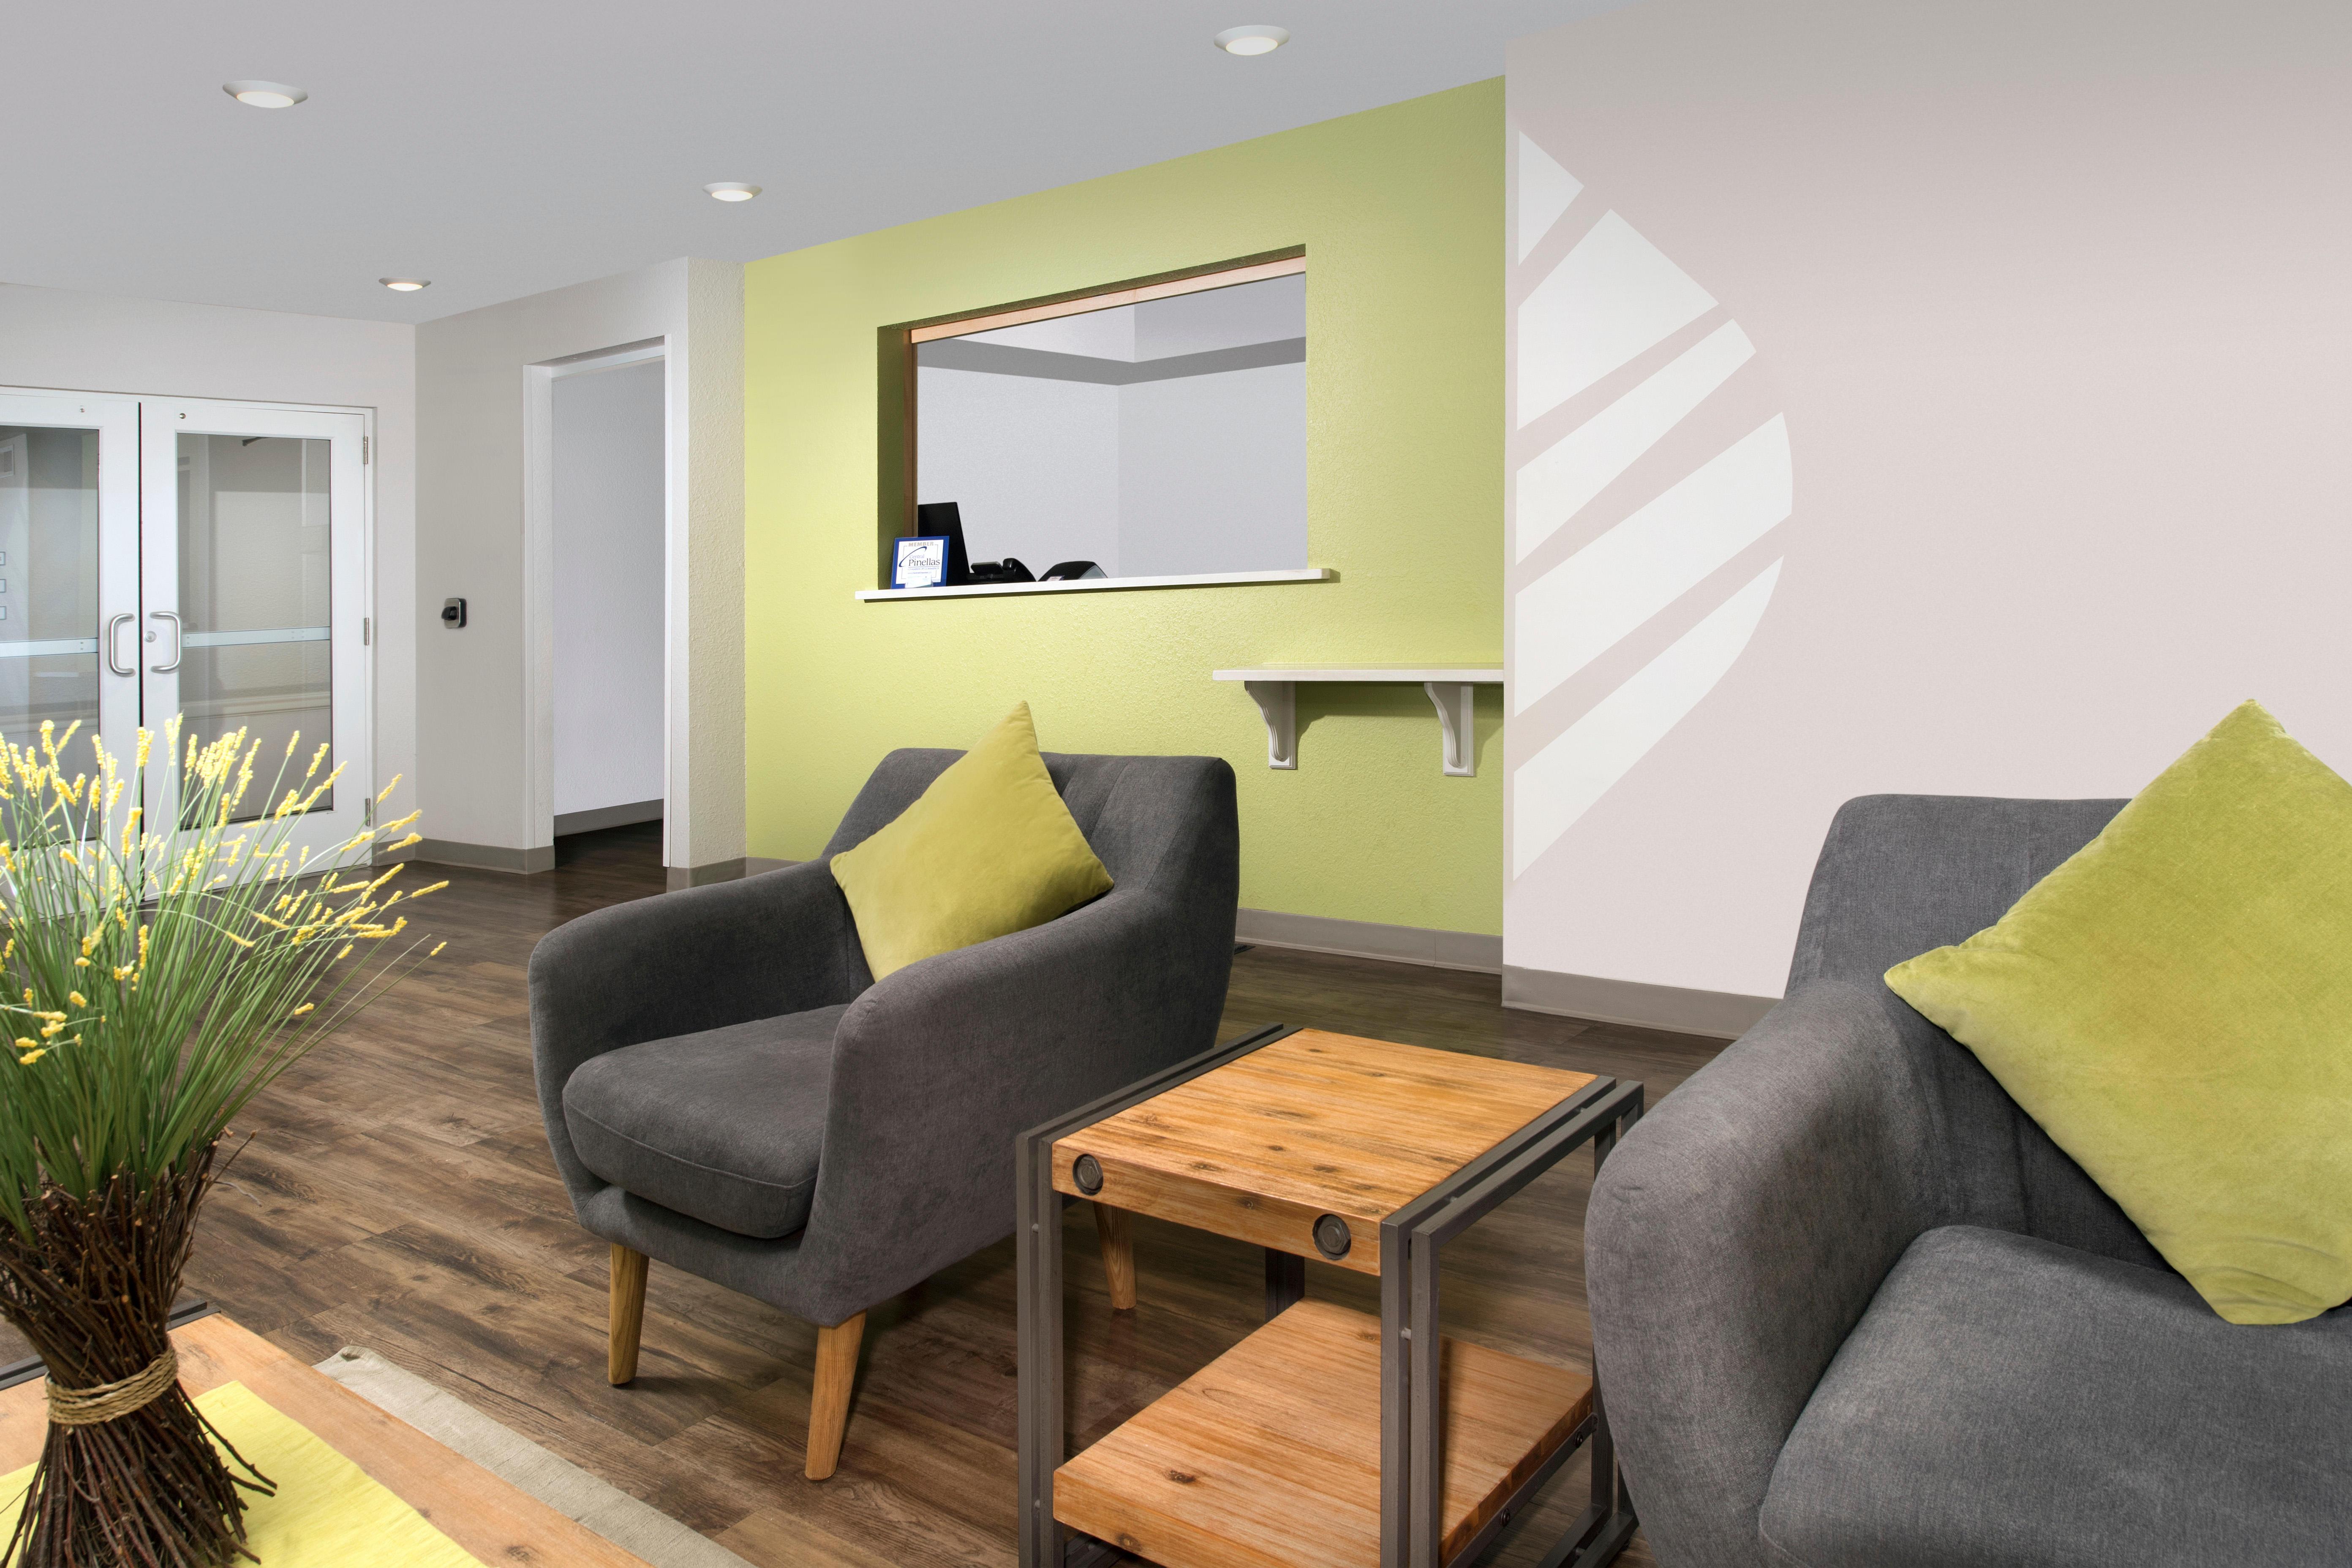 WoodSpring Suites Clearwater image 7